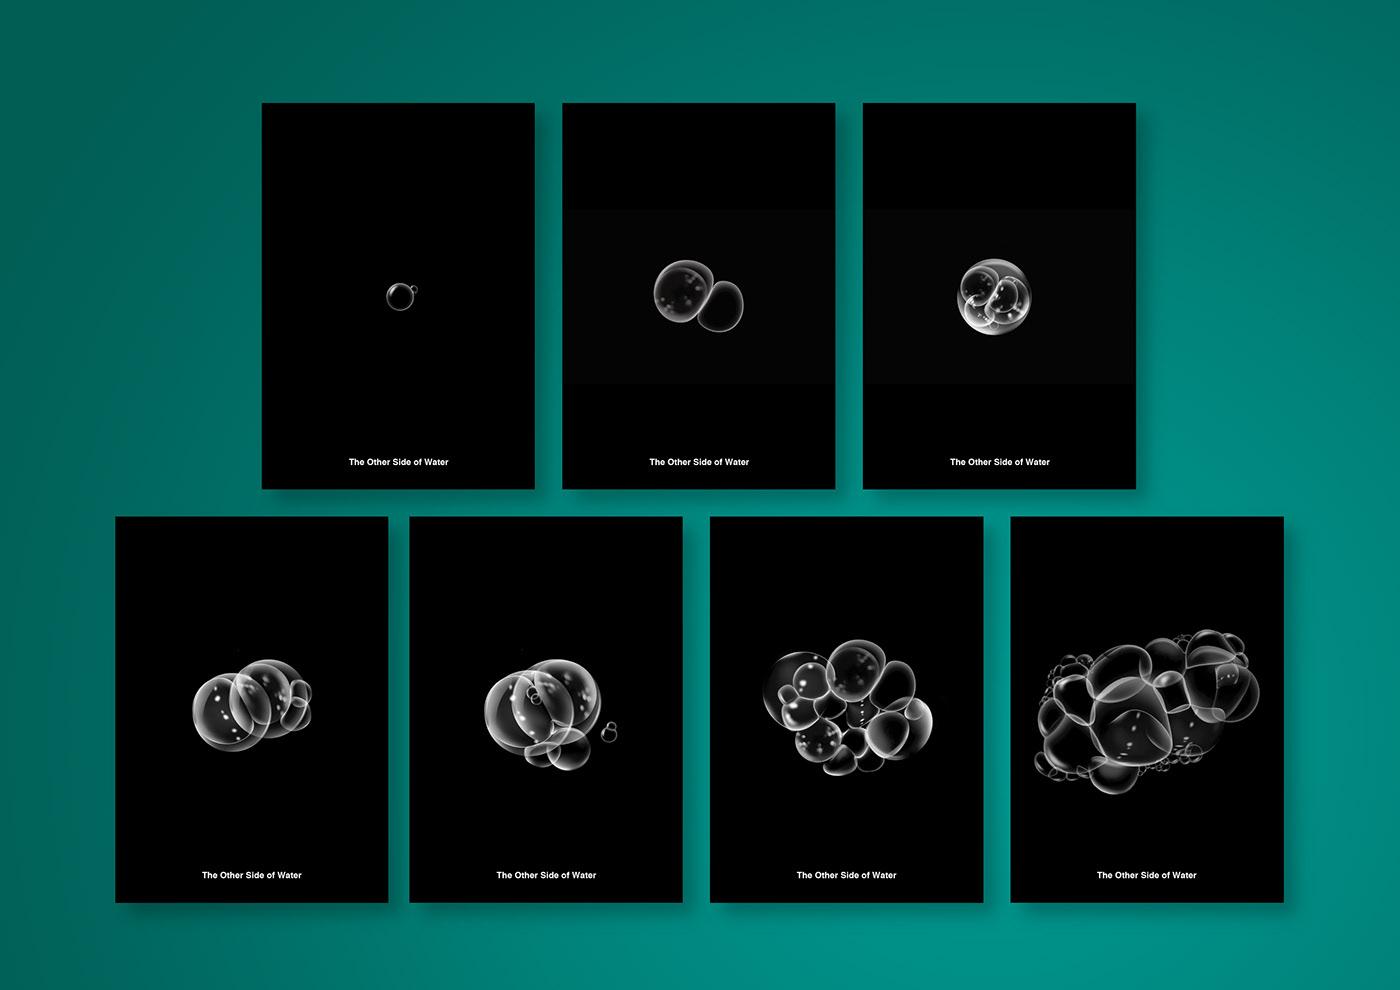 infographic,information,visualization,graphic,book,book design,information design,bubble,fish,pollution